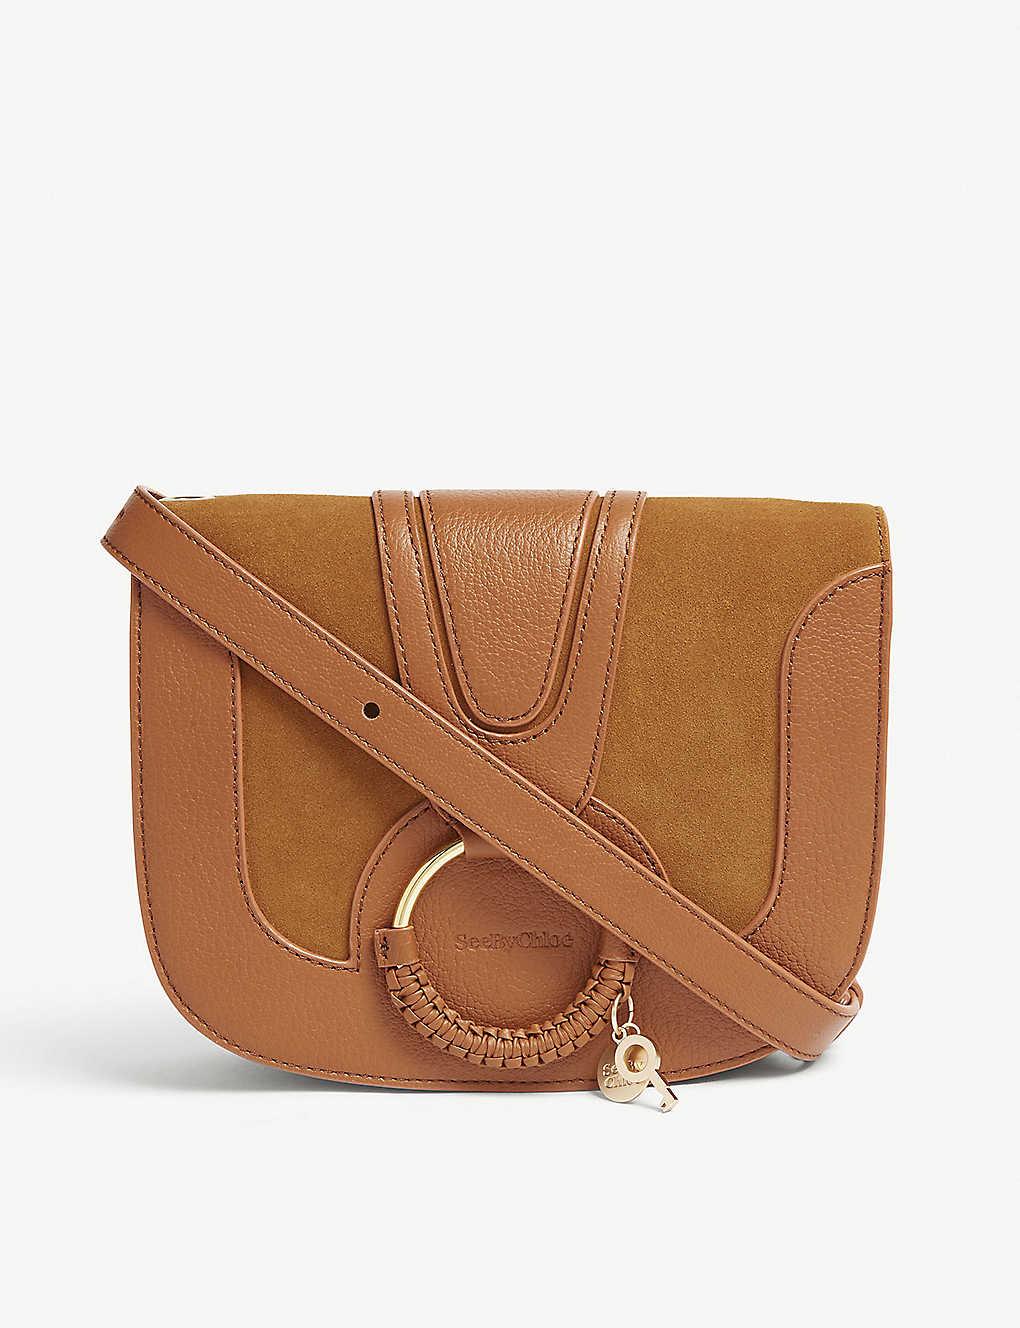 b218dc11387 SEE BY CHLOE - Hana medium leather saddle bag | Selfridges.com